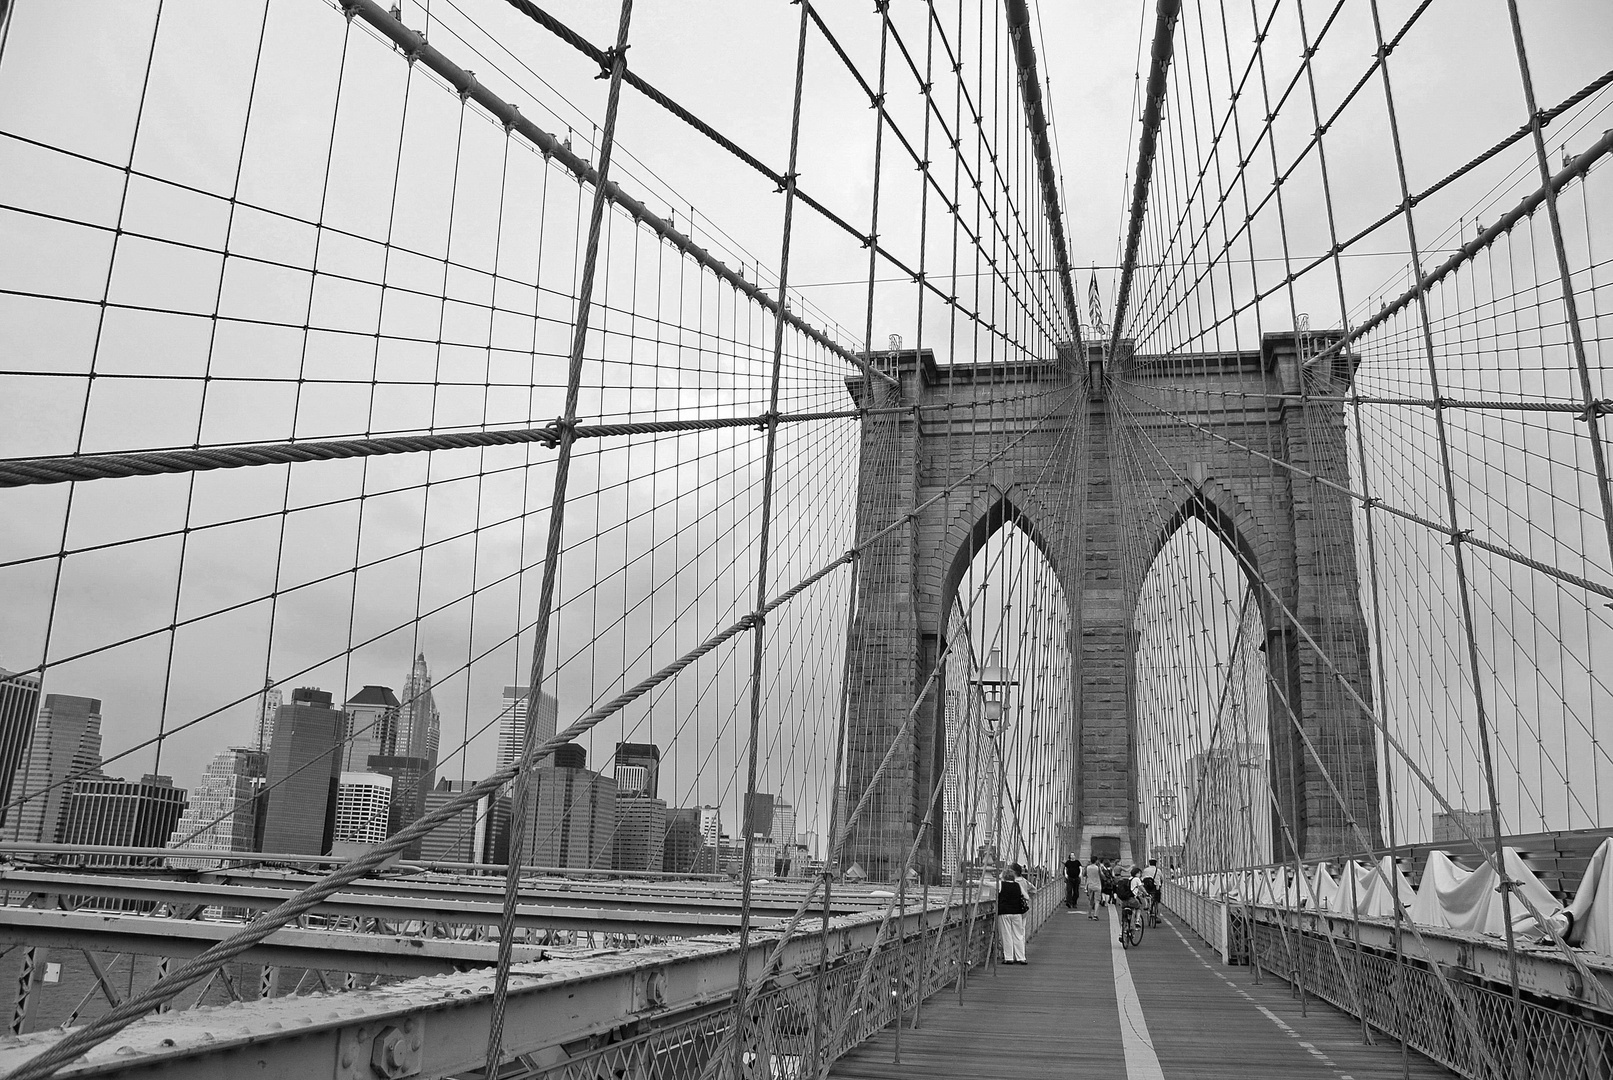 Brooklyn bridge, sous un déluge absolu!